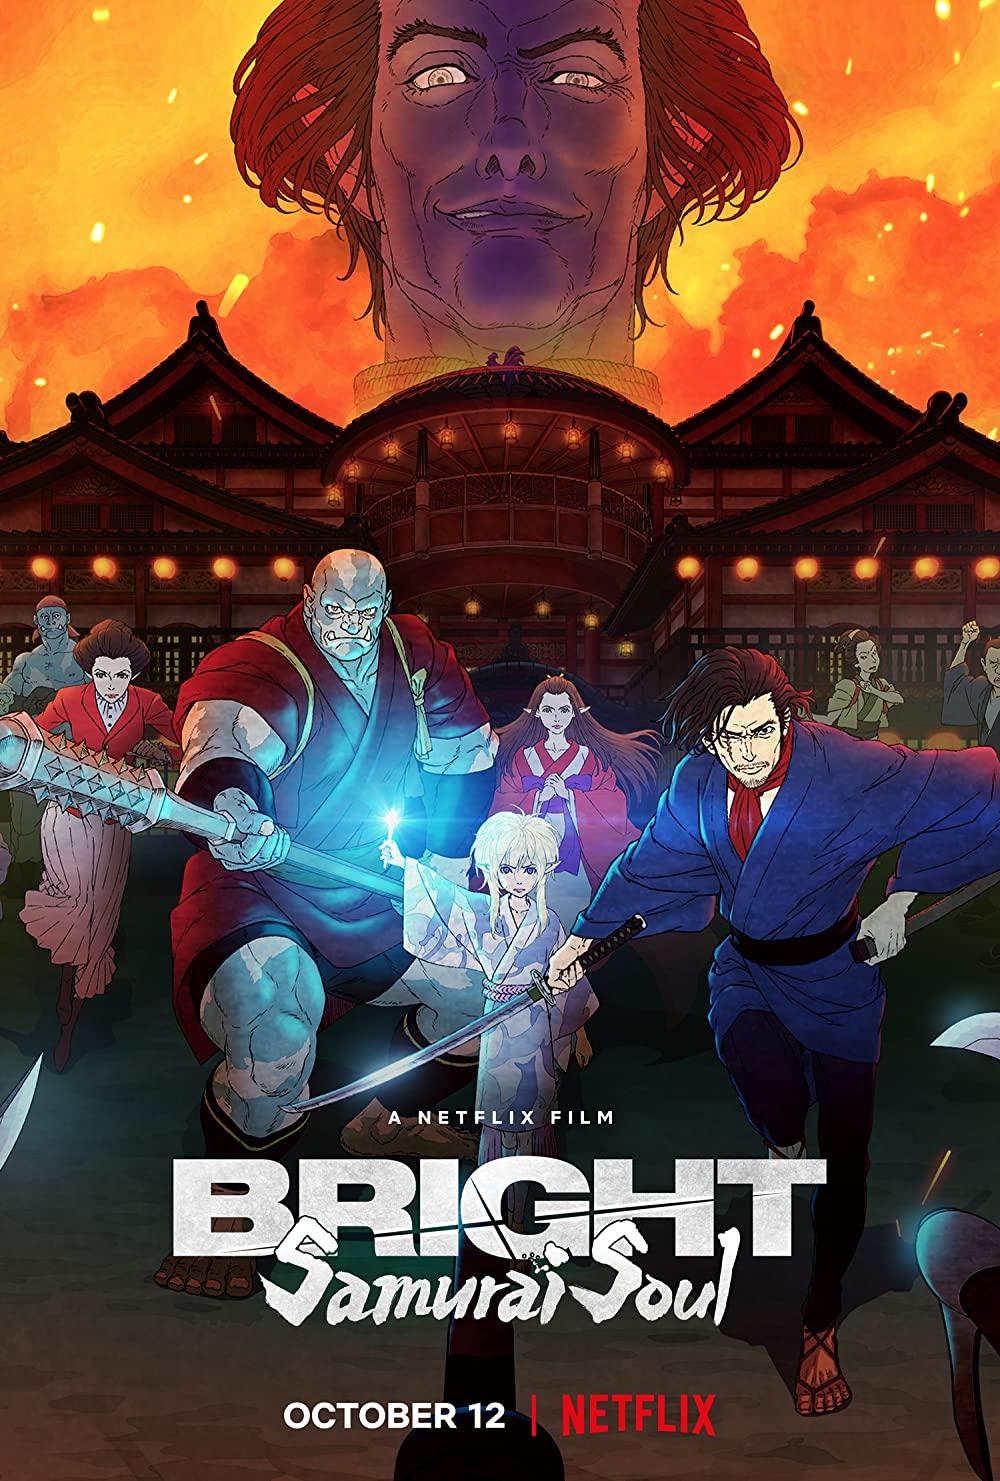 Bright: Samurai Soul